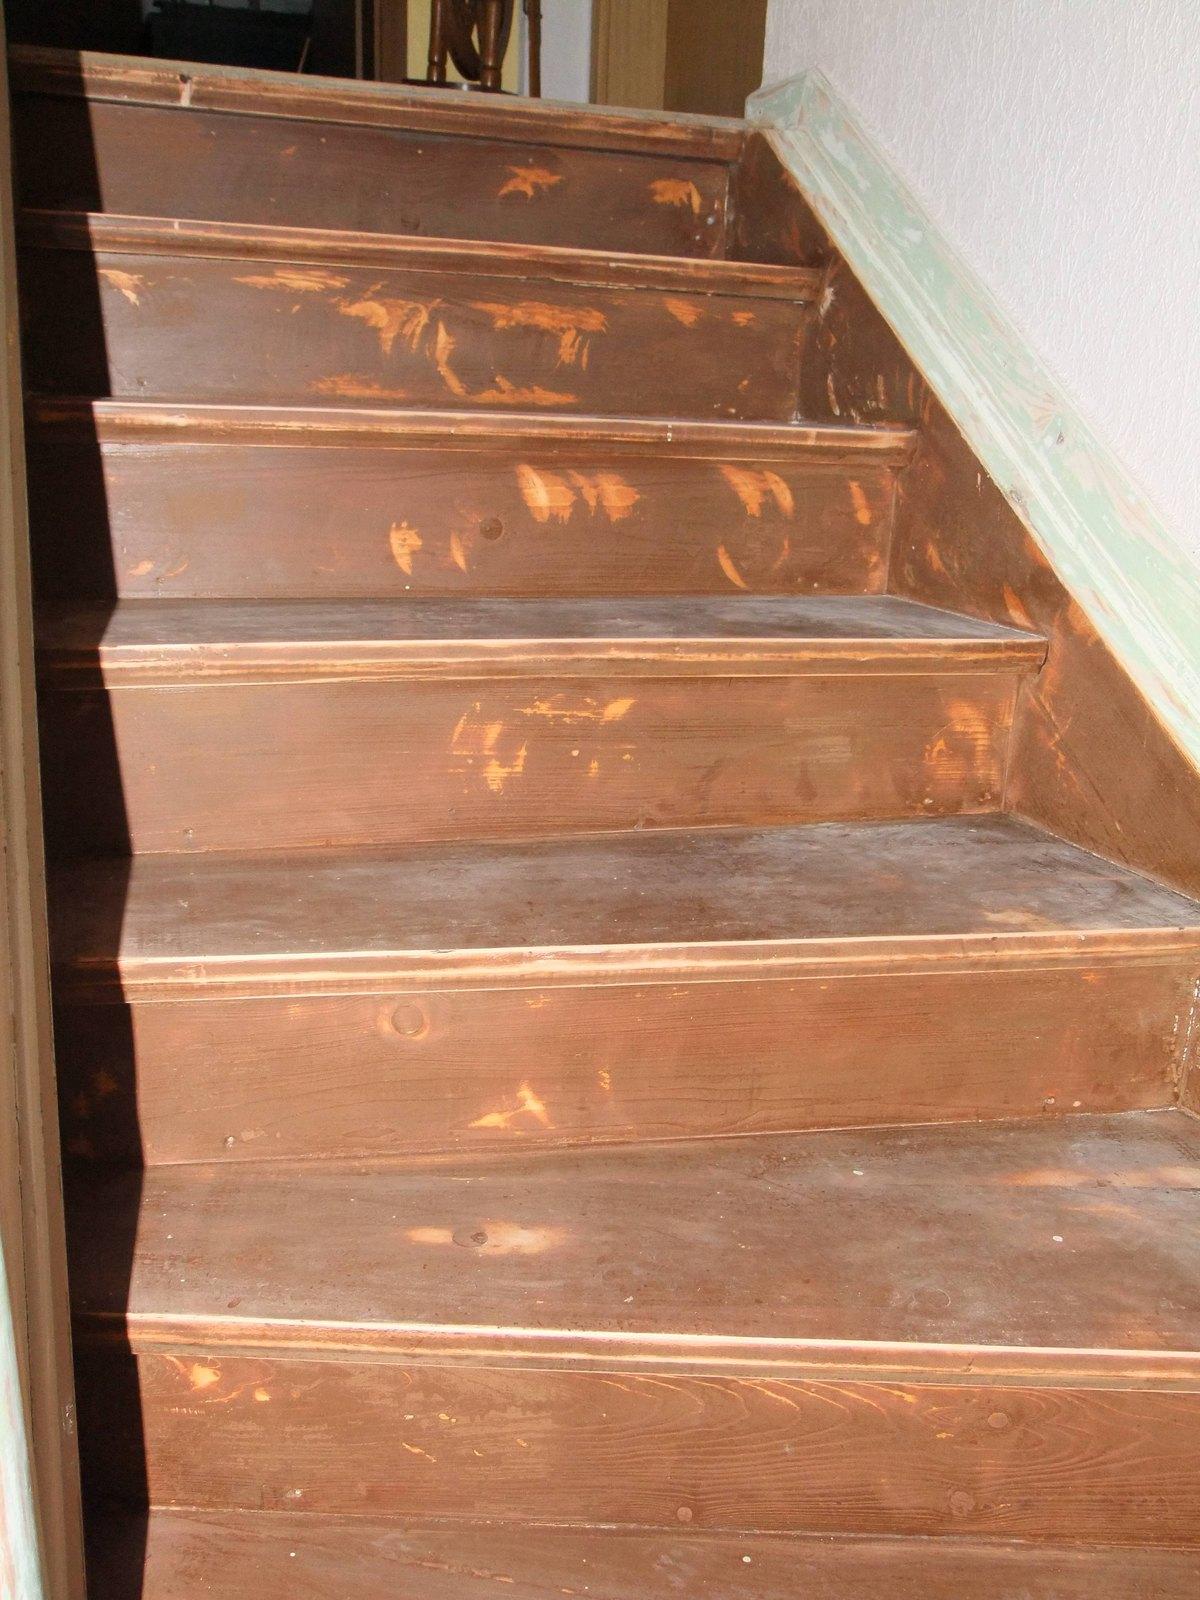 Ochsenblut Entfernen michas holzblog projektvorstellung treppenrenovierung teil 2